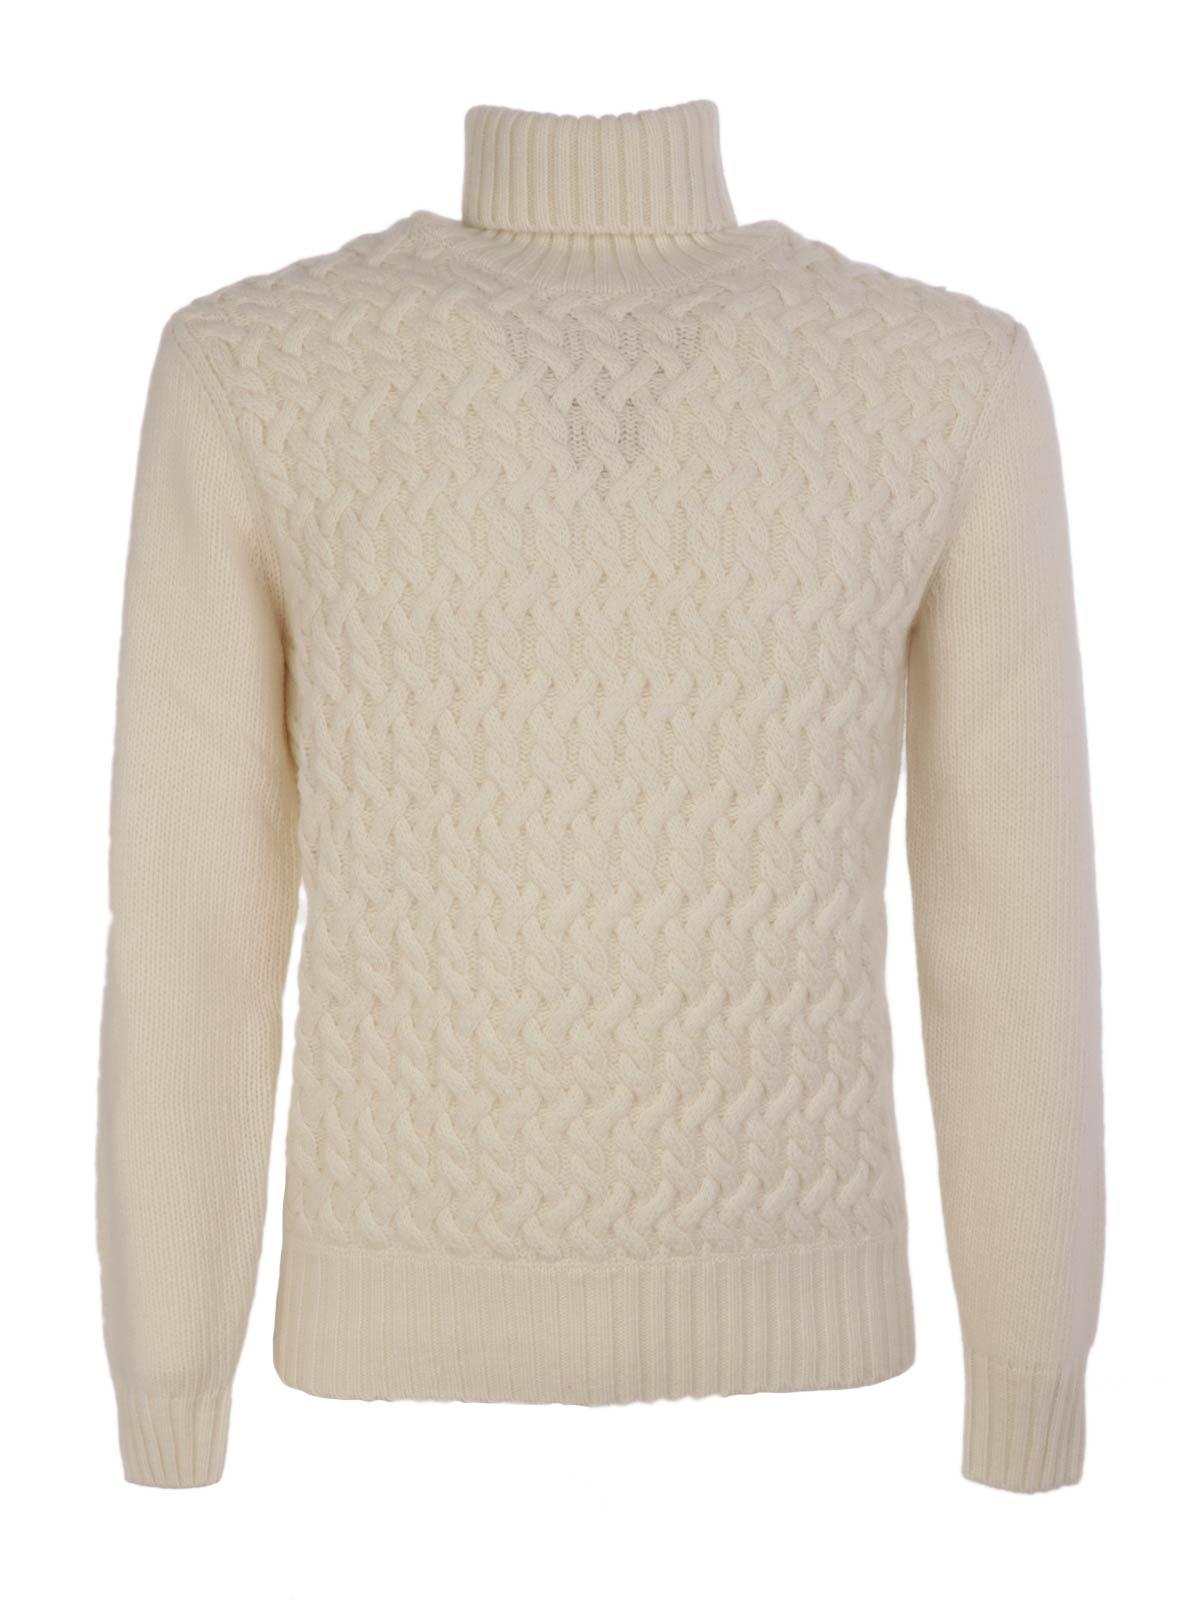 Picture of ELEVENTY | Men's Wool Turtleneck Sweater